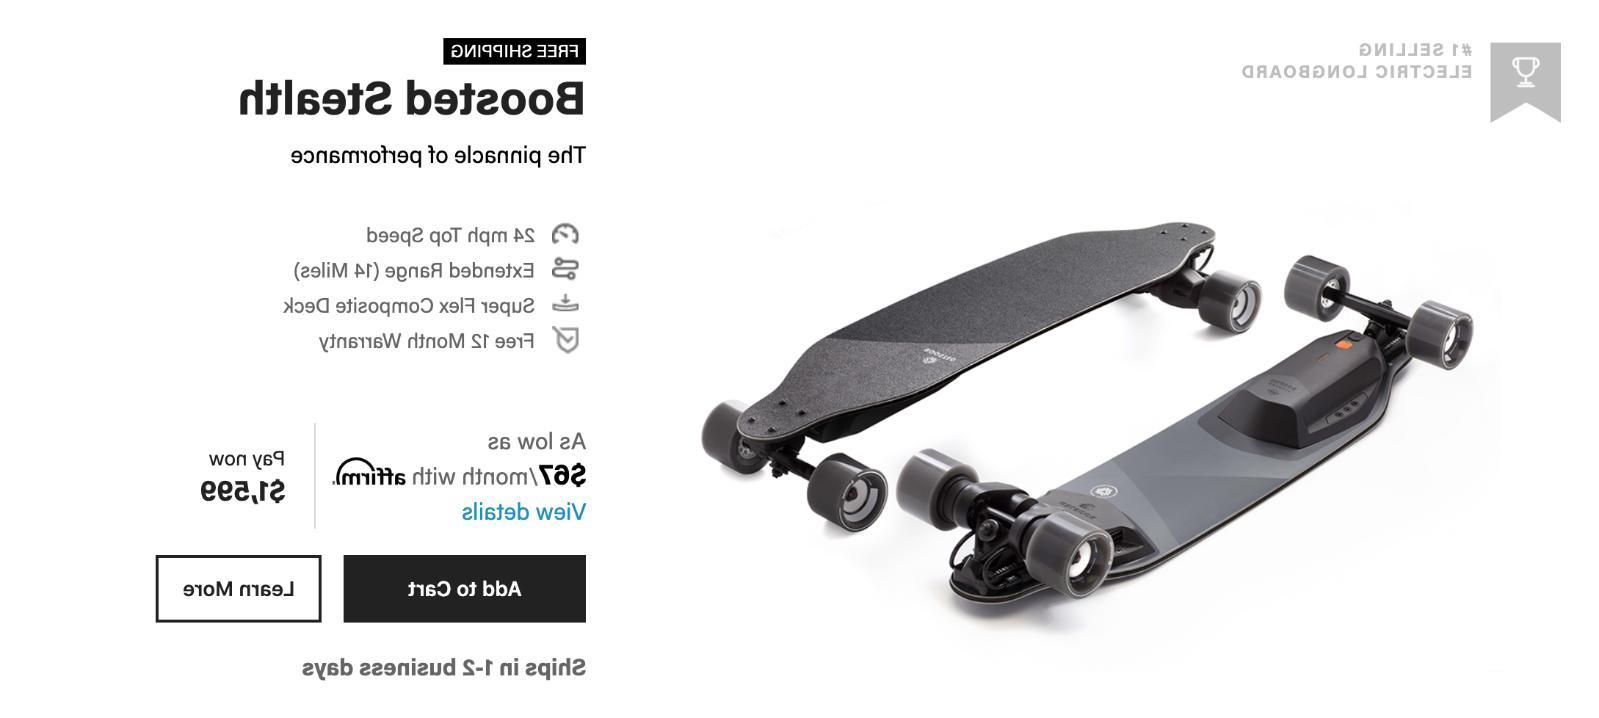 CHECKOUT Board MINI Skateboard Brand New $750